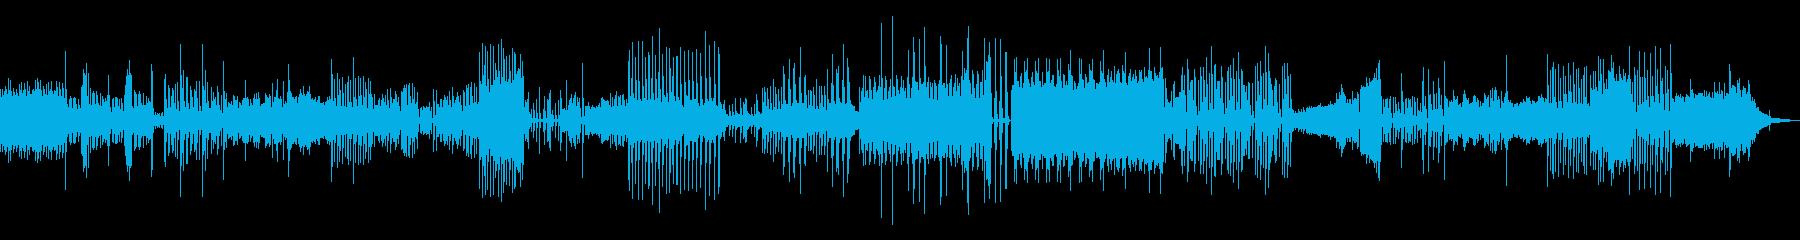 「BGMの宝庫3」-禿山の一夜よりの再生済みの波形